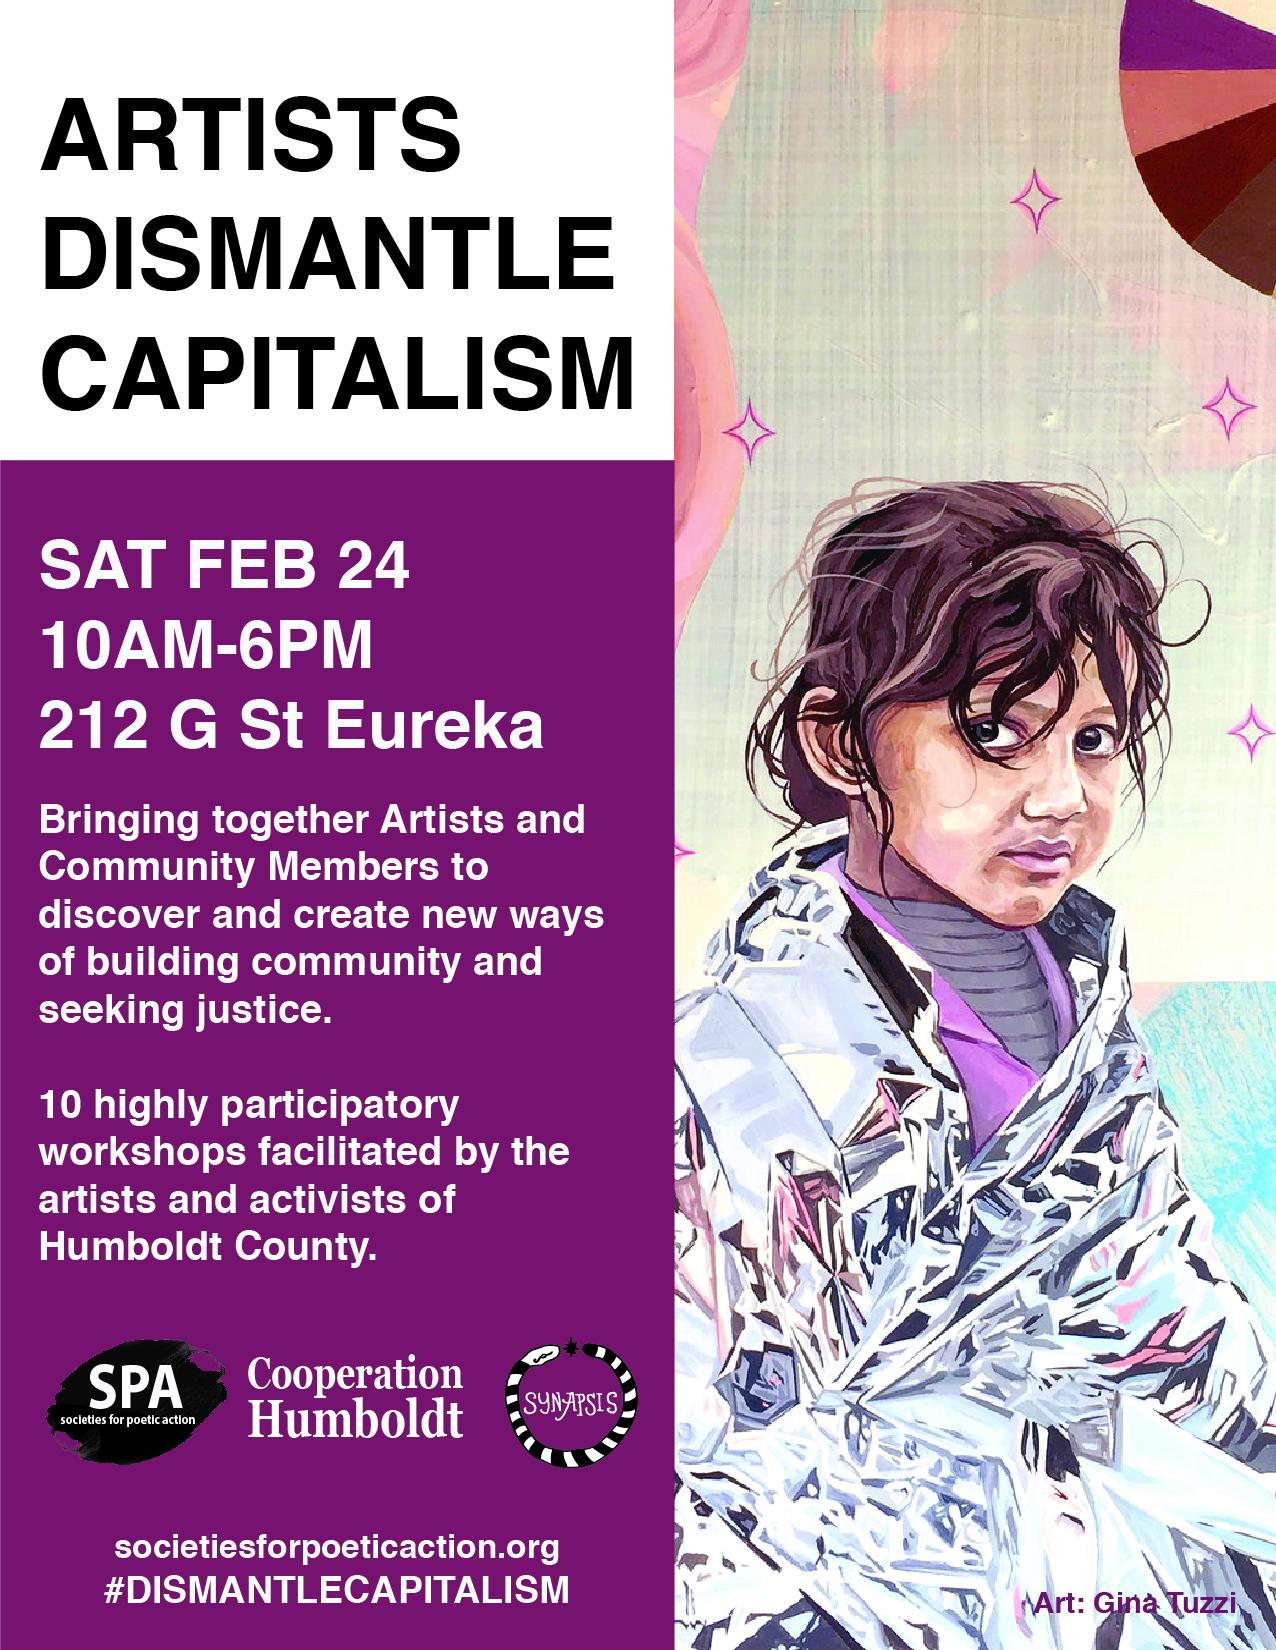 artist dismantle capitalism posters-03.jpg